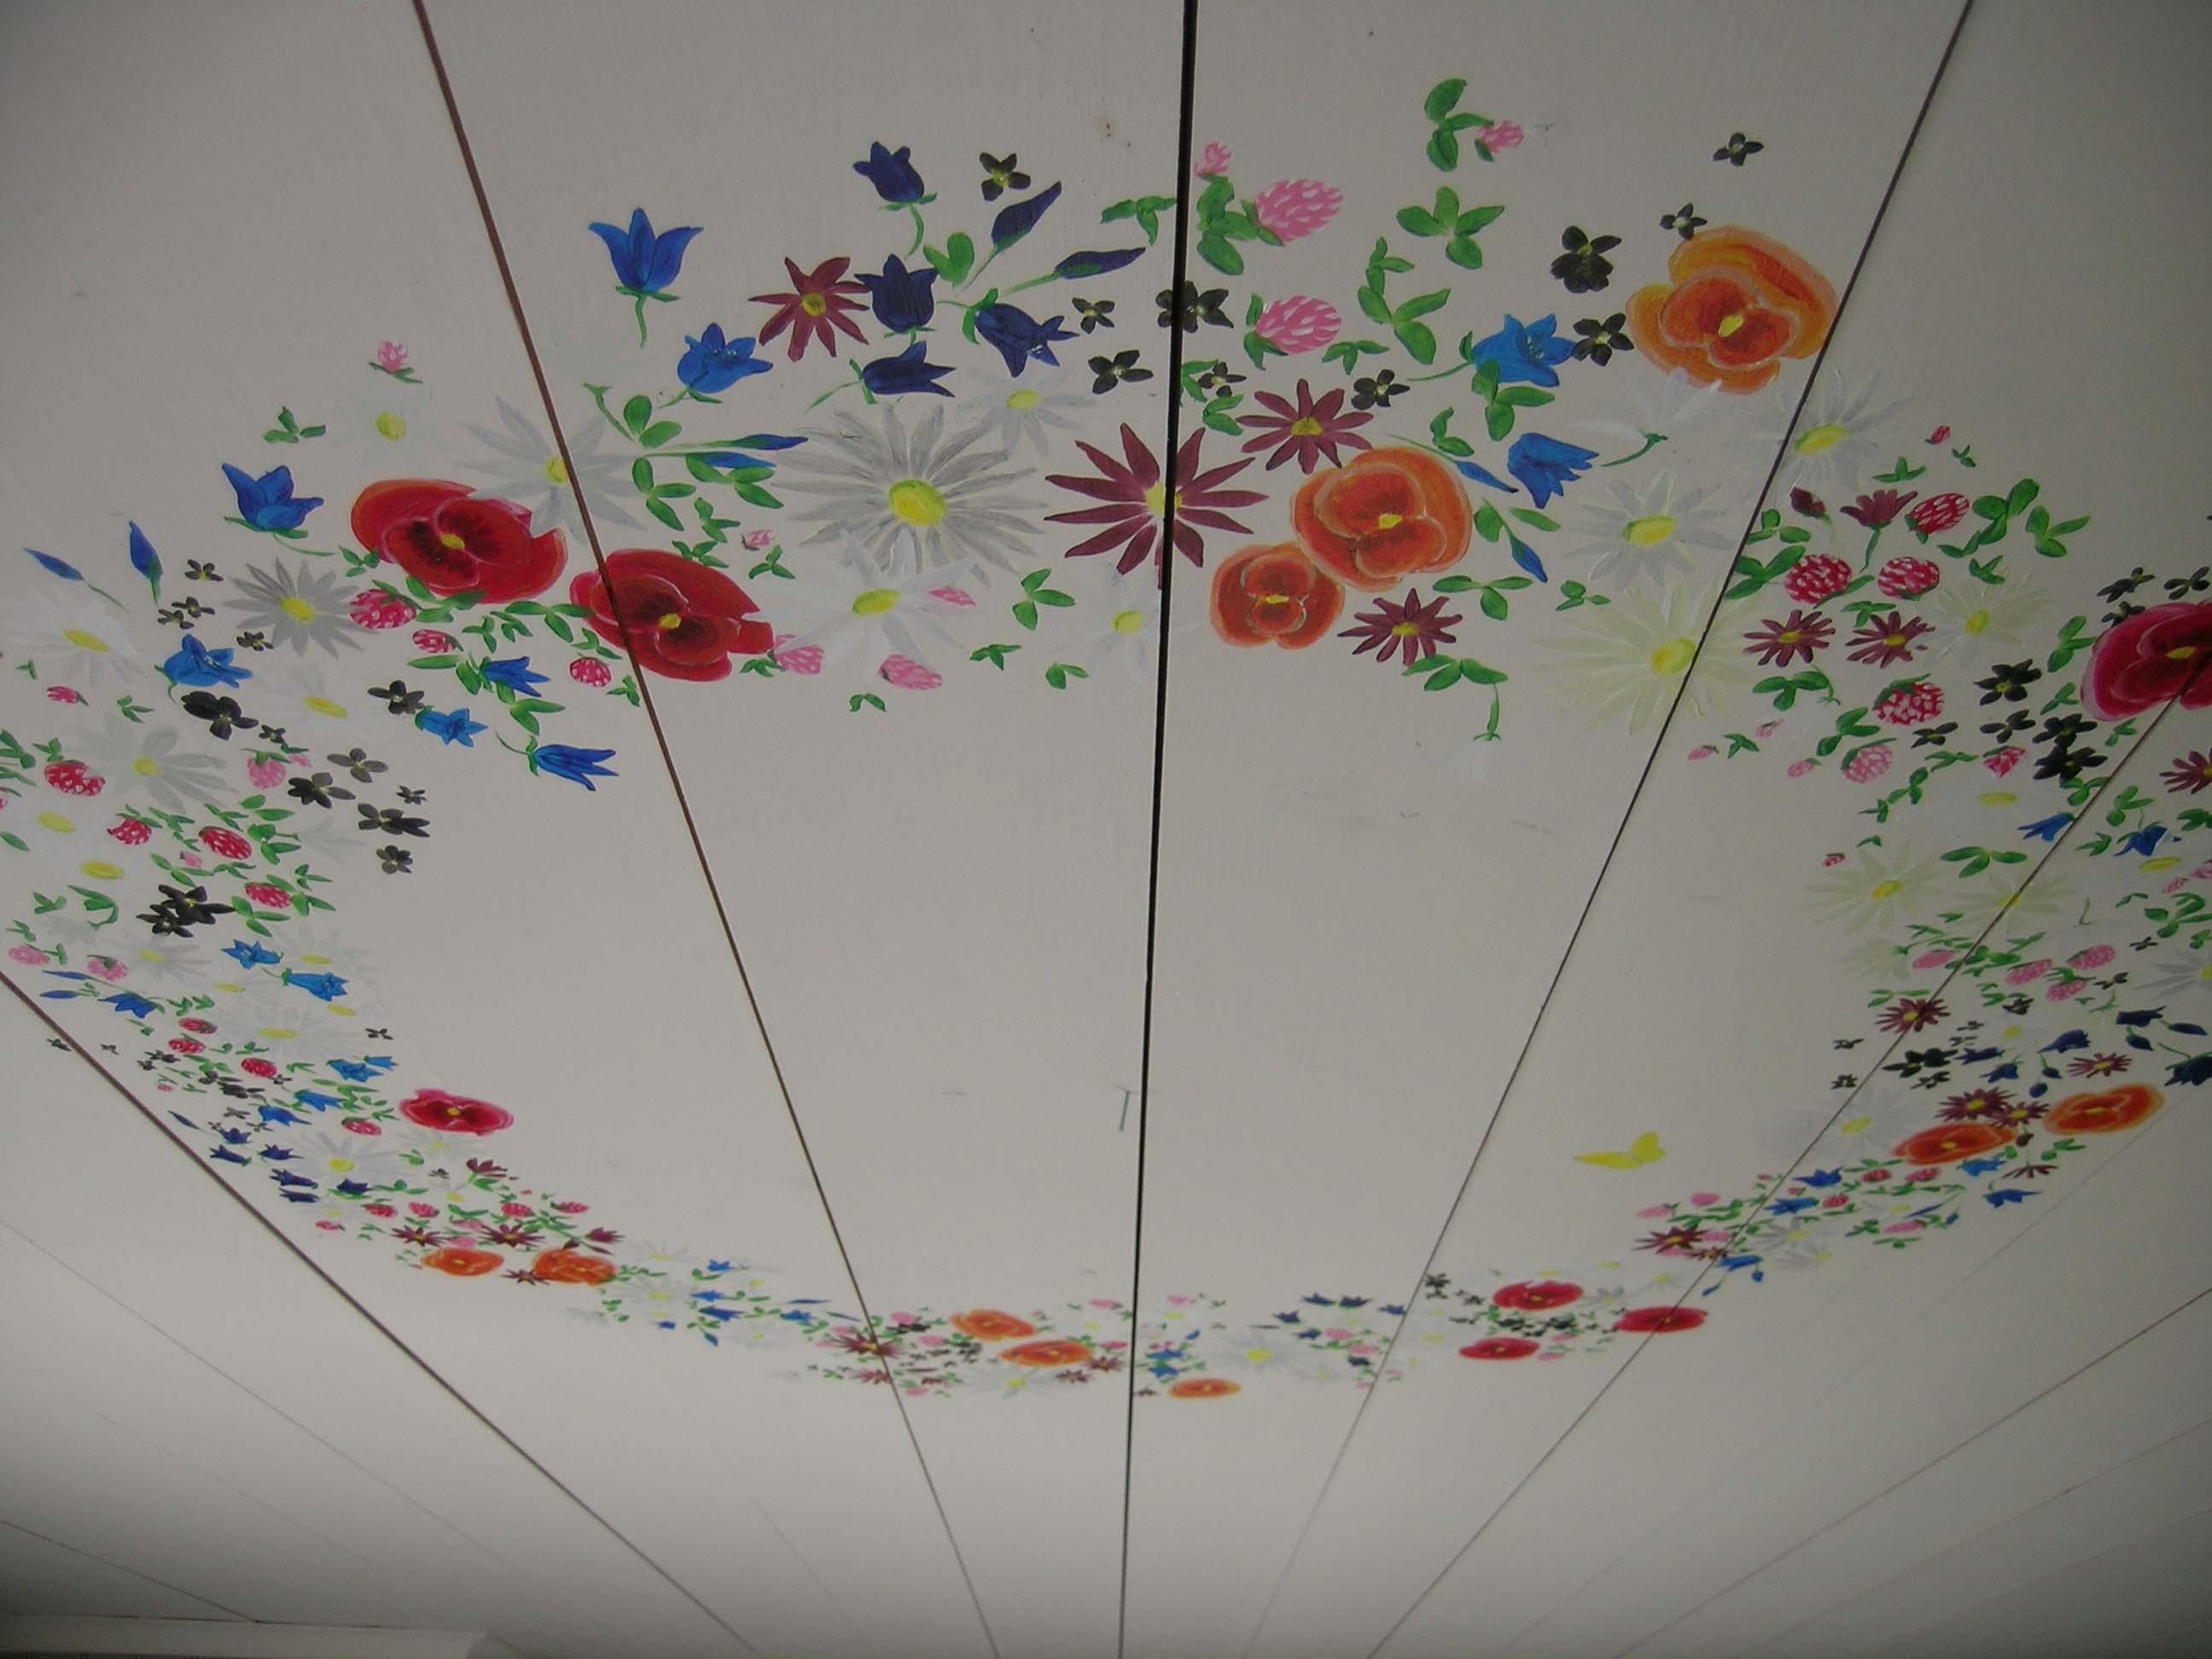 blomkrans fermansbo 20080819